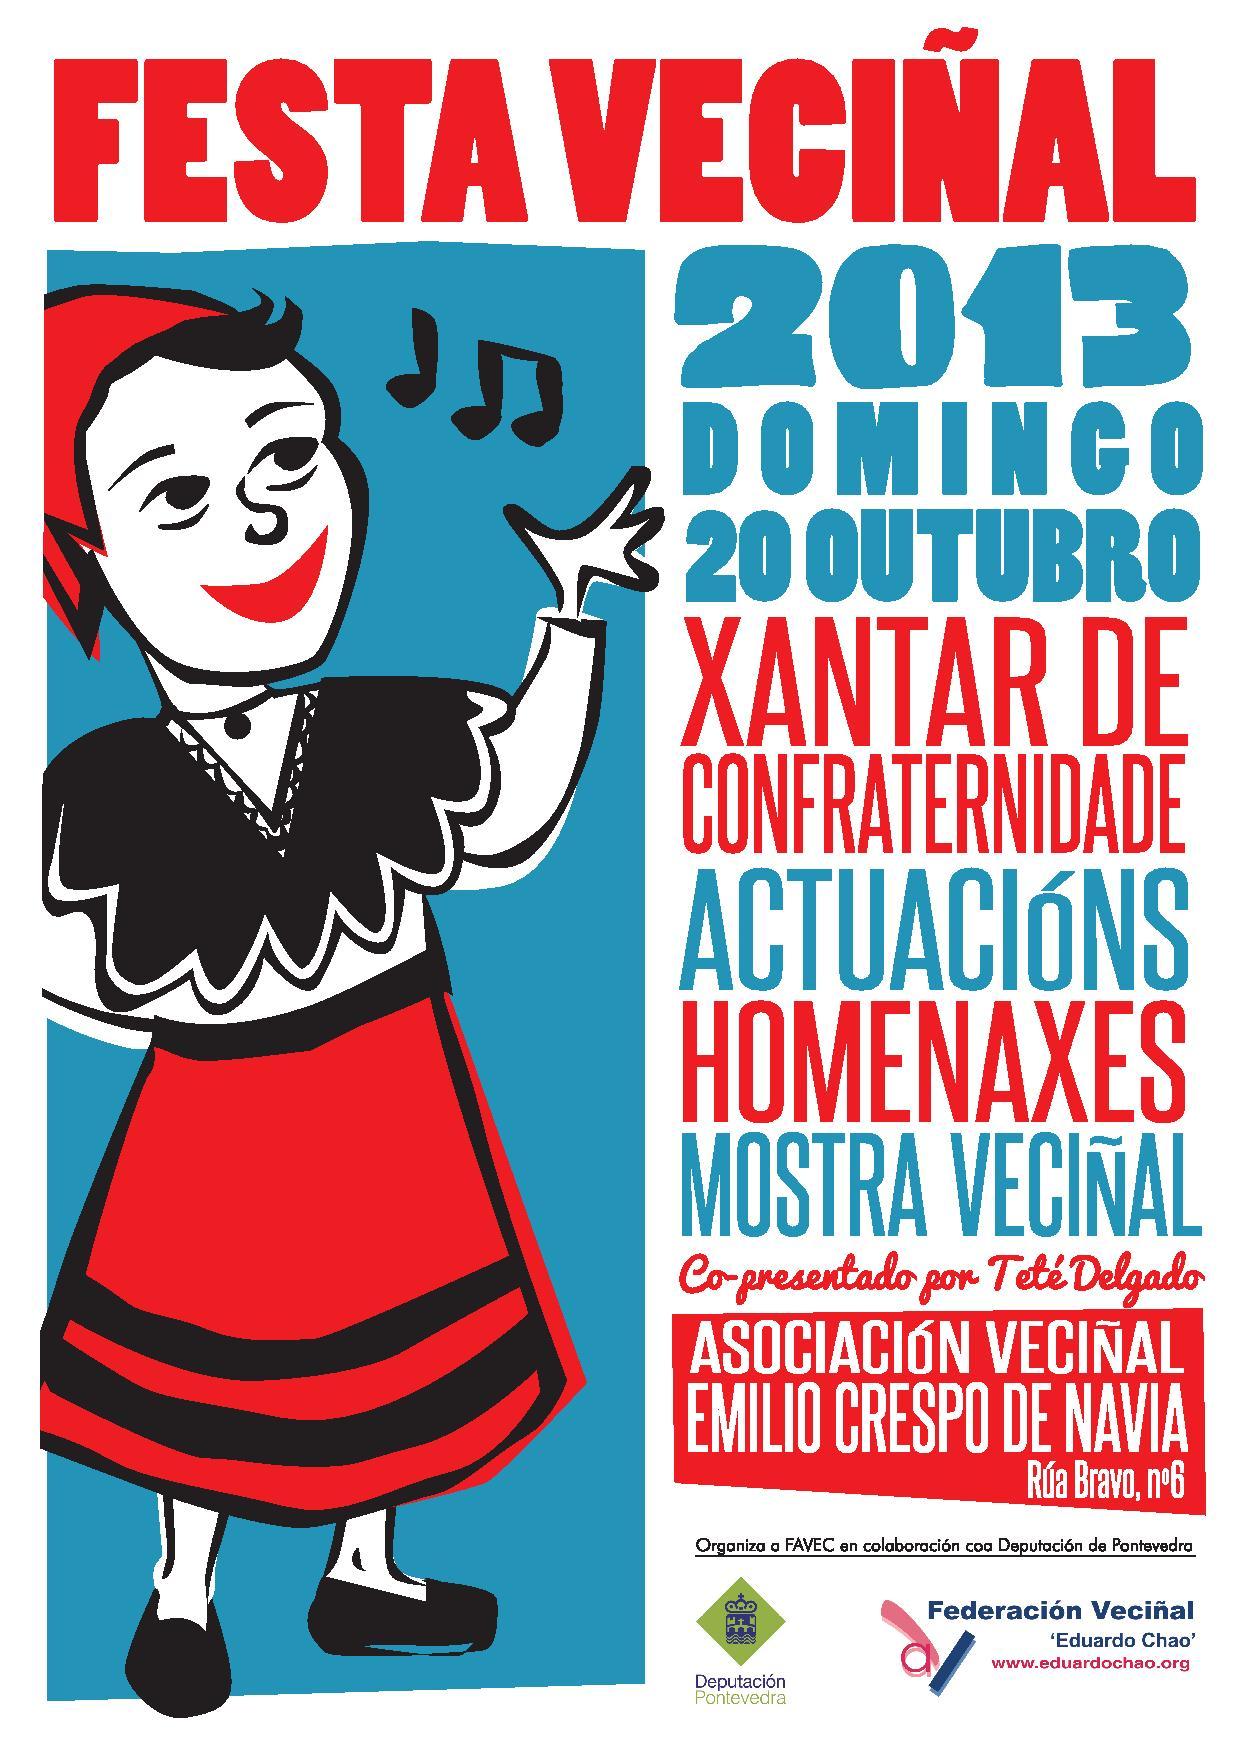 Gran Festa Veciñal 2013